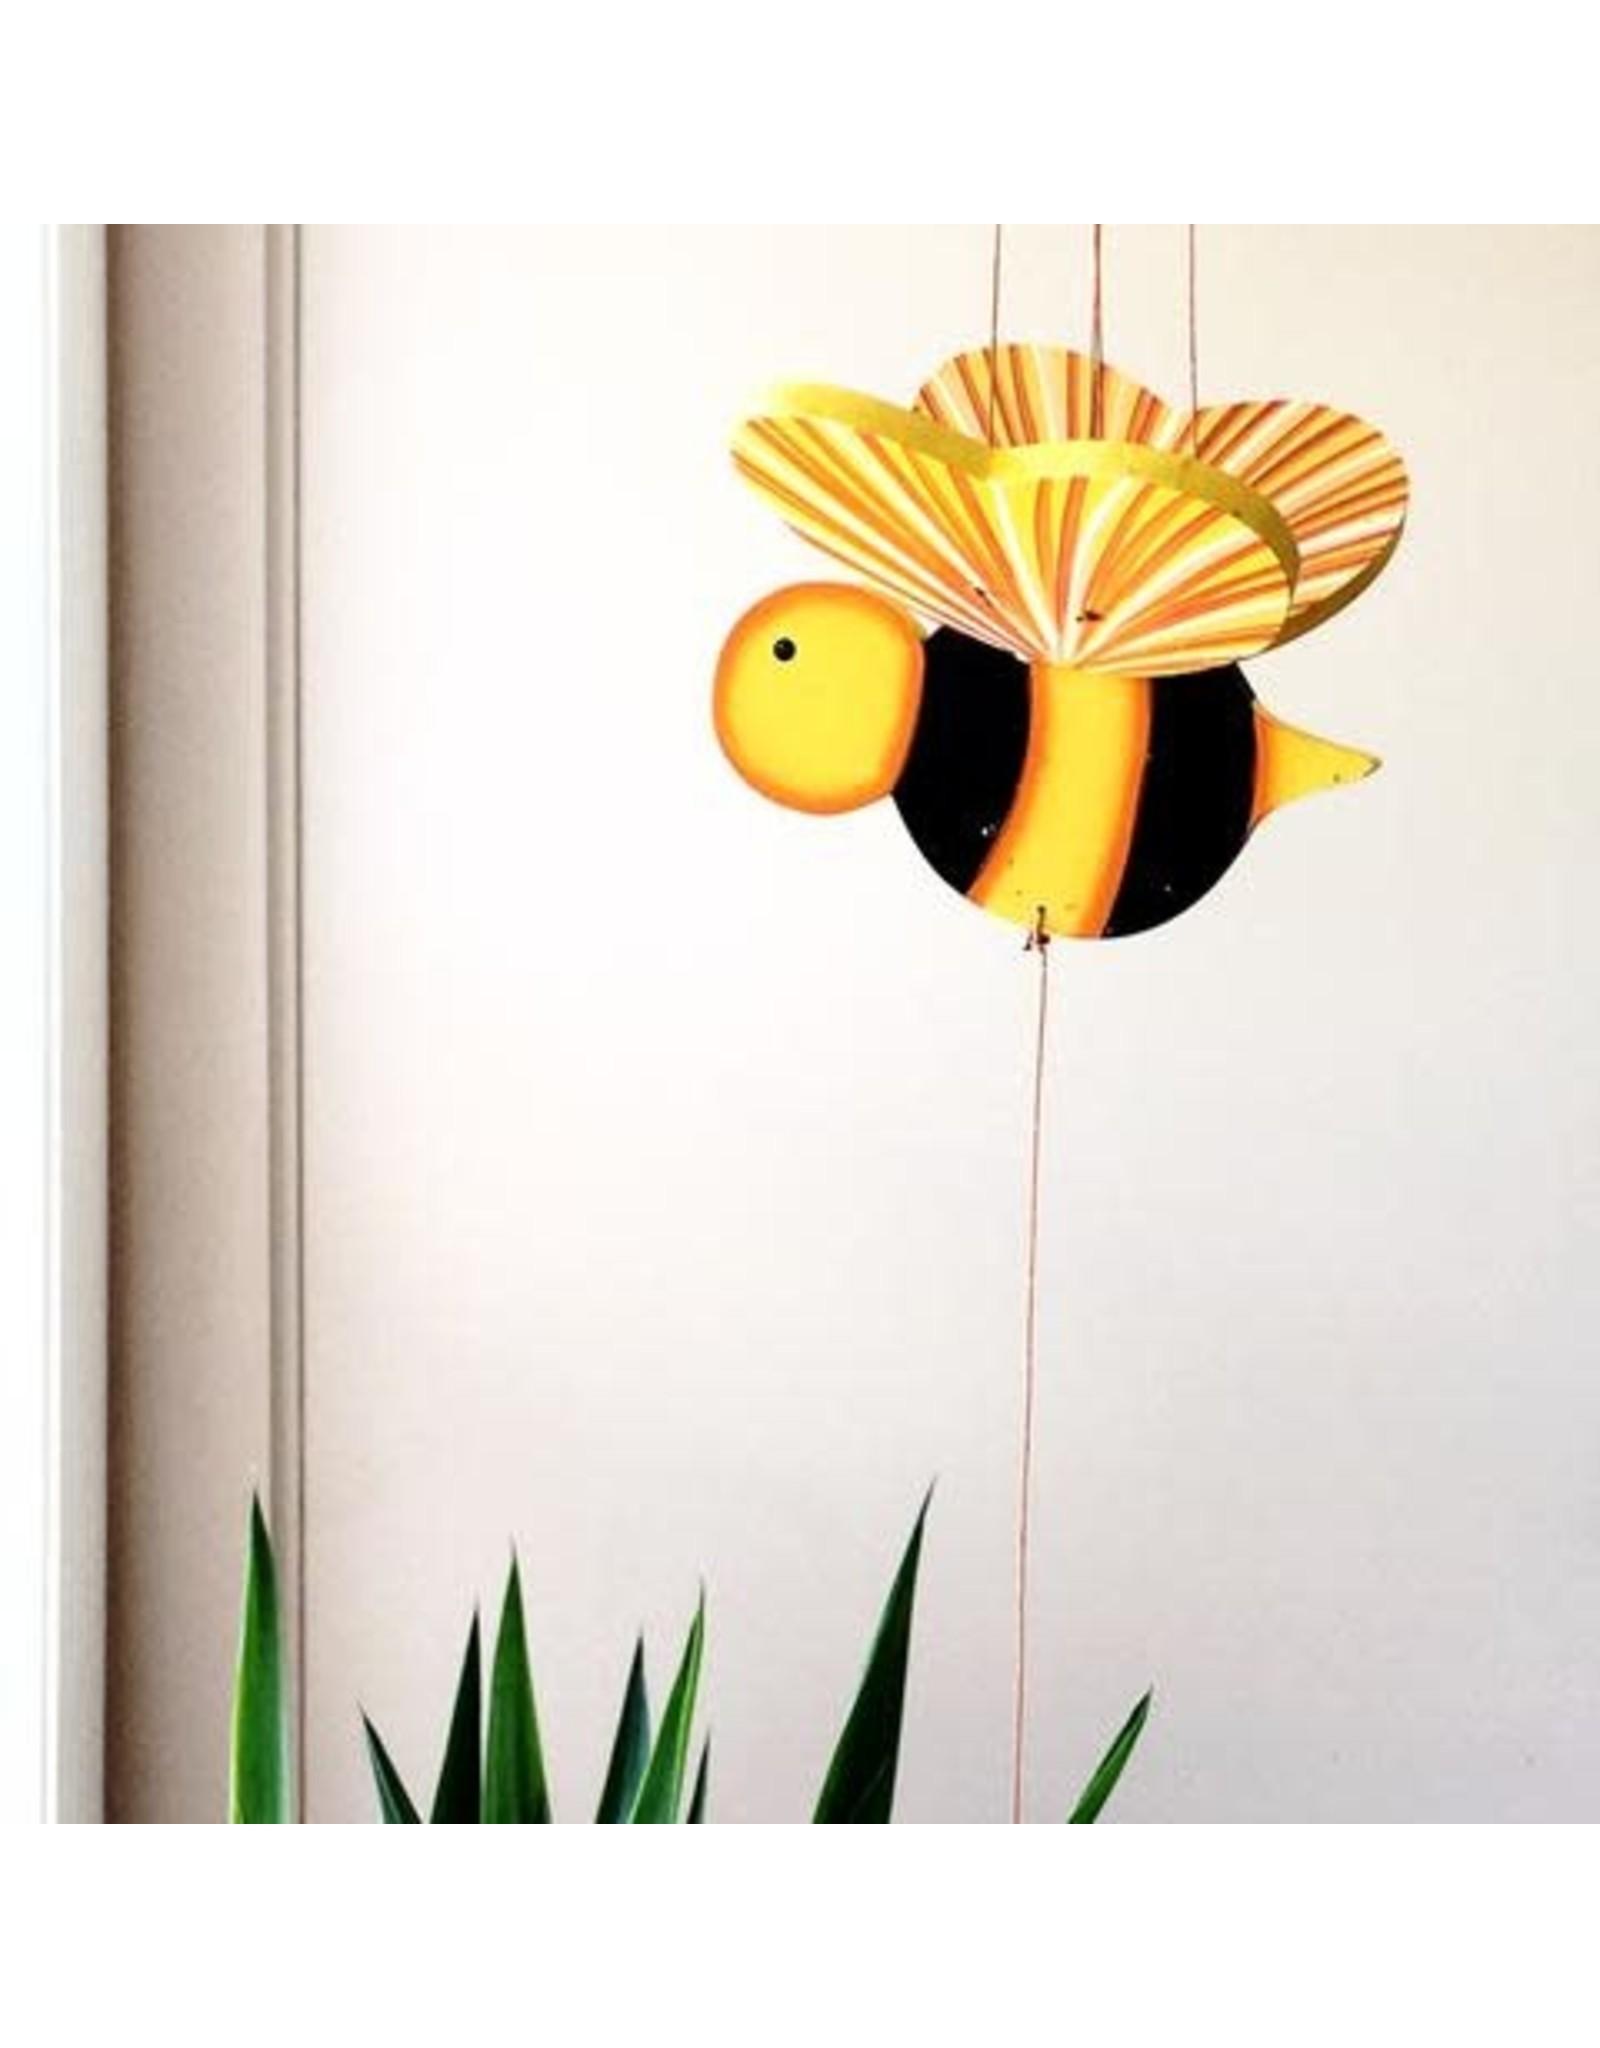 Tulia's Bee Mobile, Columbia